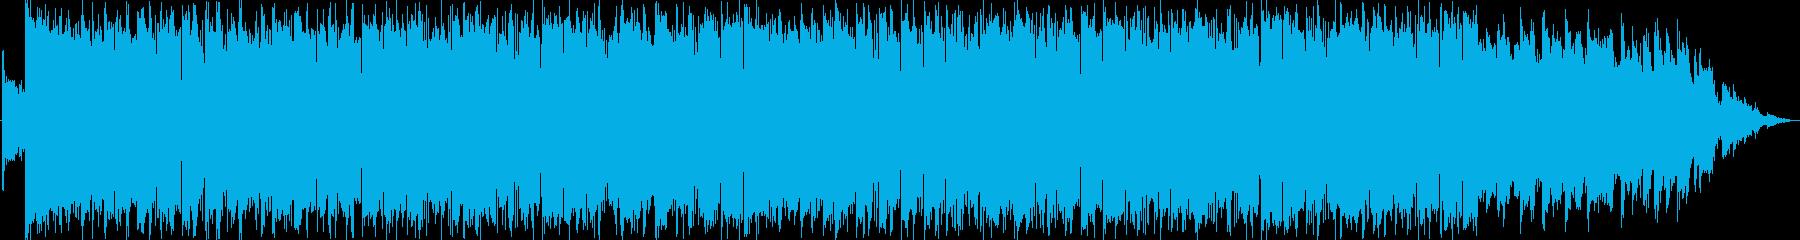 Tranceアレンジの曲です。mp3 …の再生済みの波形